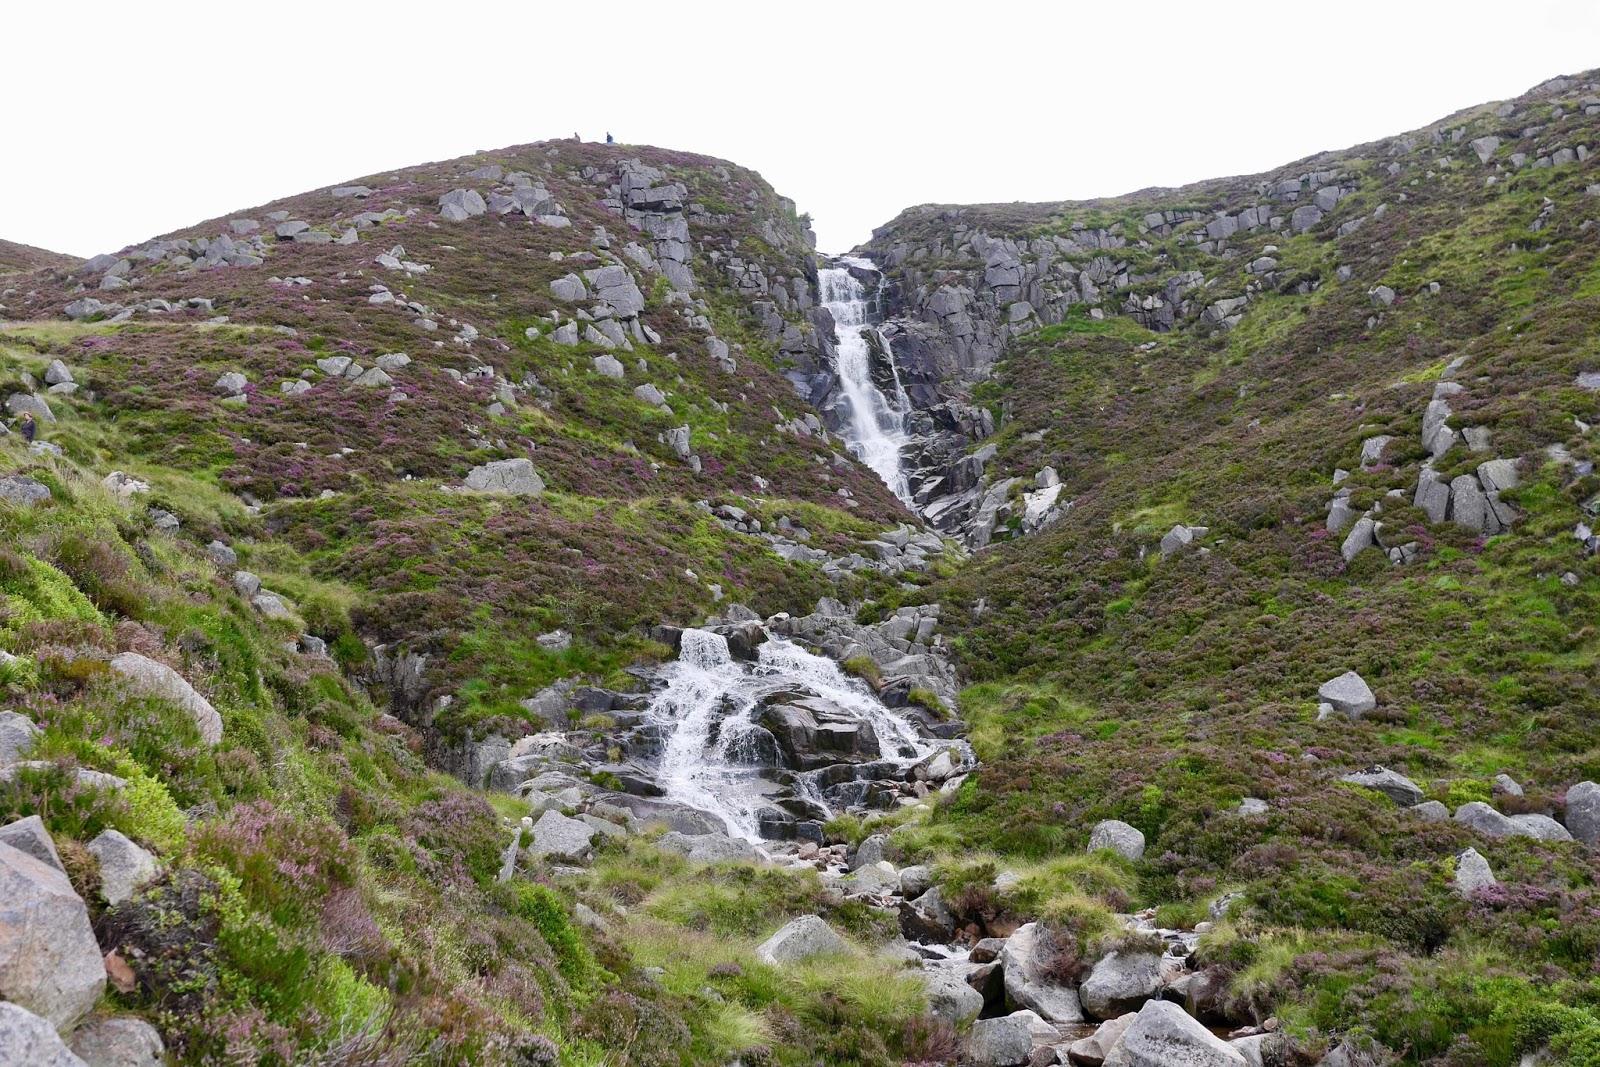 Lochnagar Munro - Cal McTravel - www.calmctravels.com